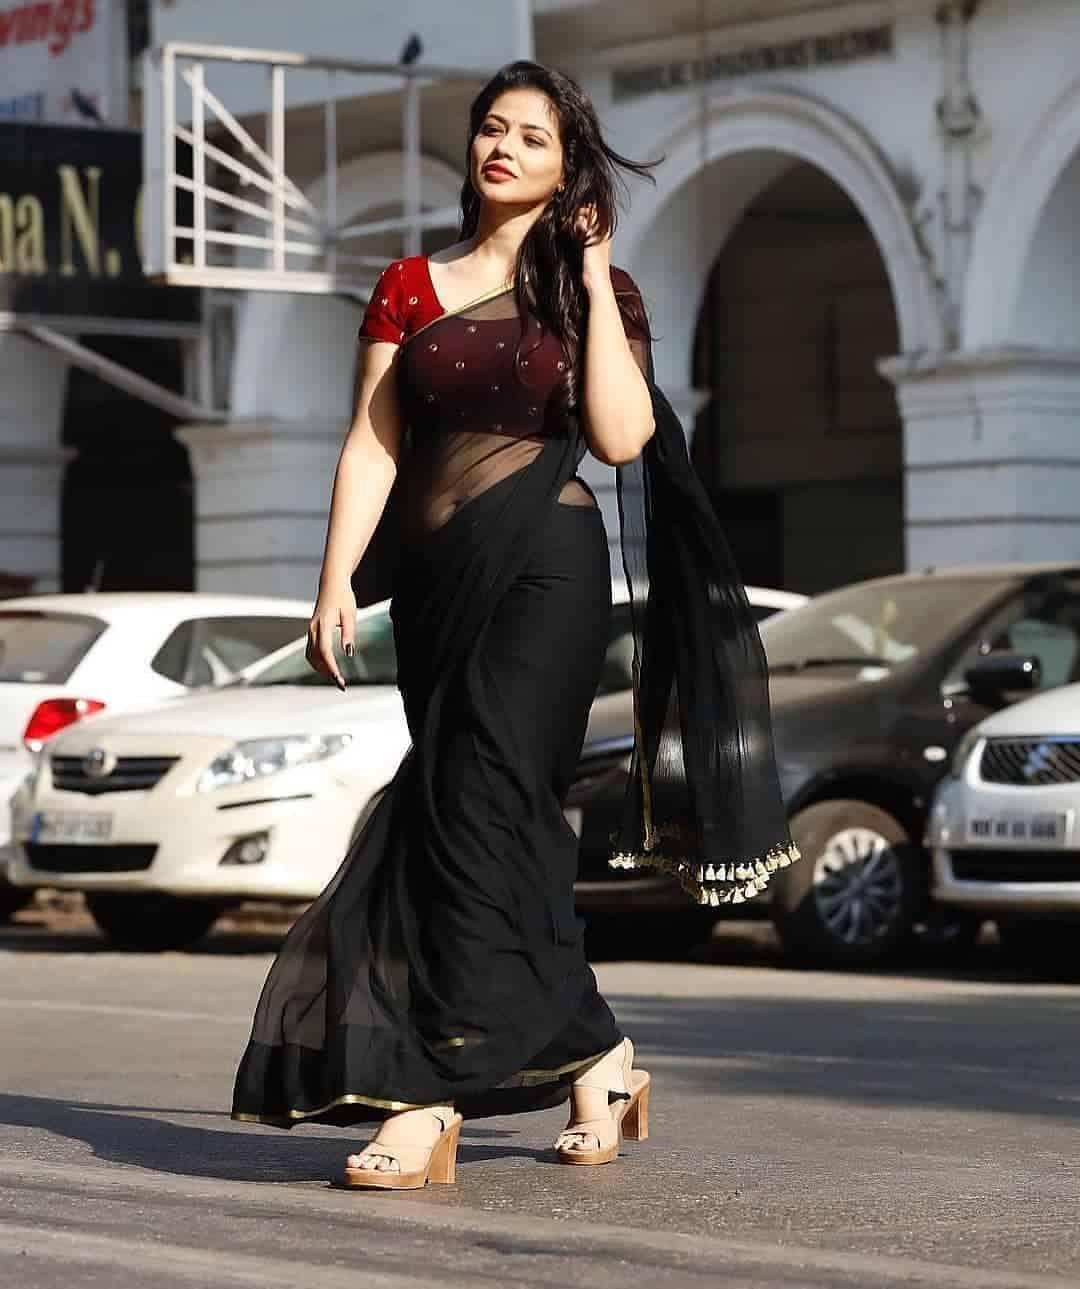 Priyanka Jawalkar Wiki, Age, Biography, Boyfriends, Family & More 4